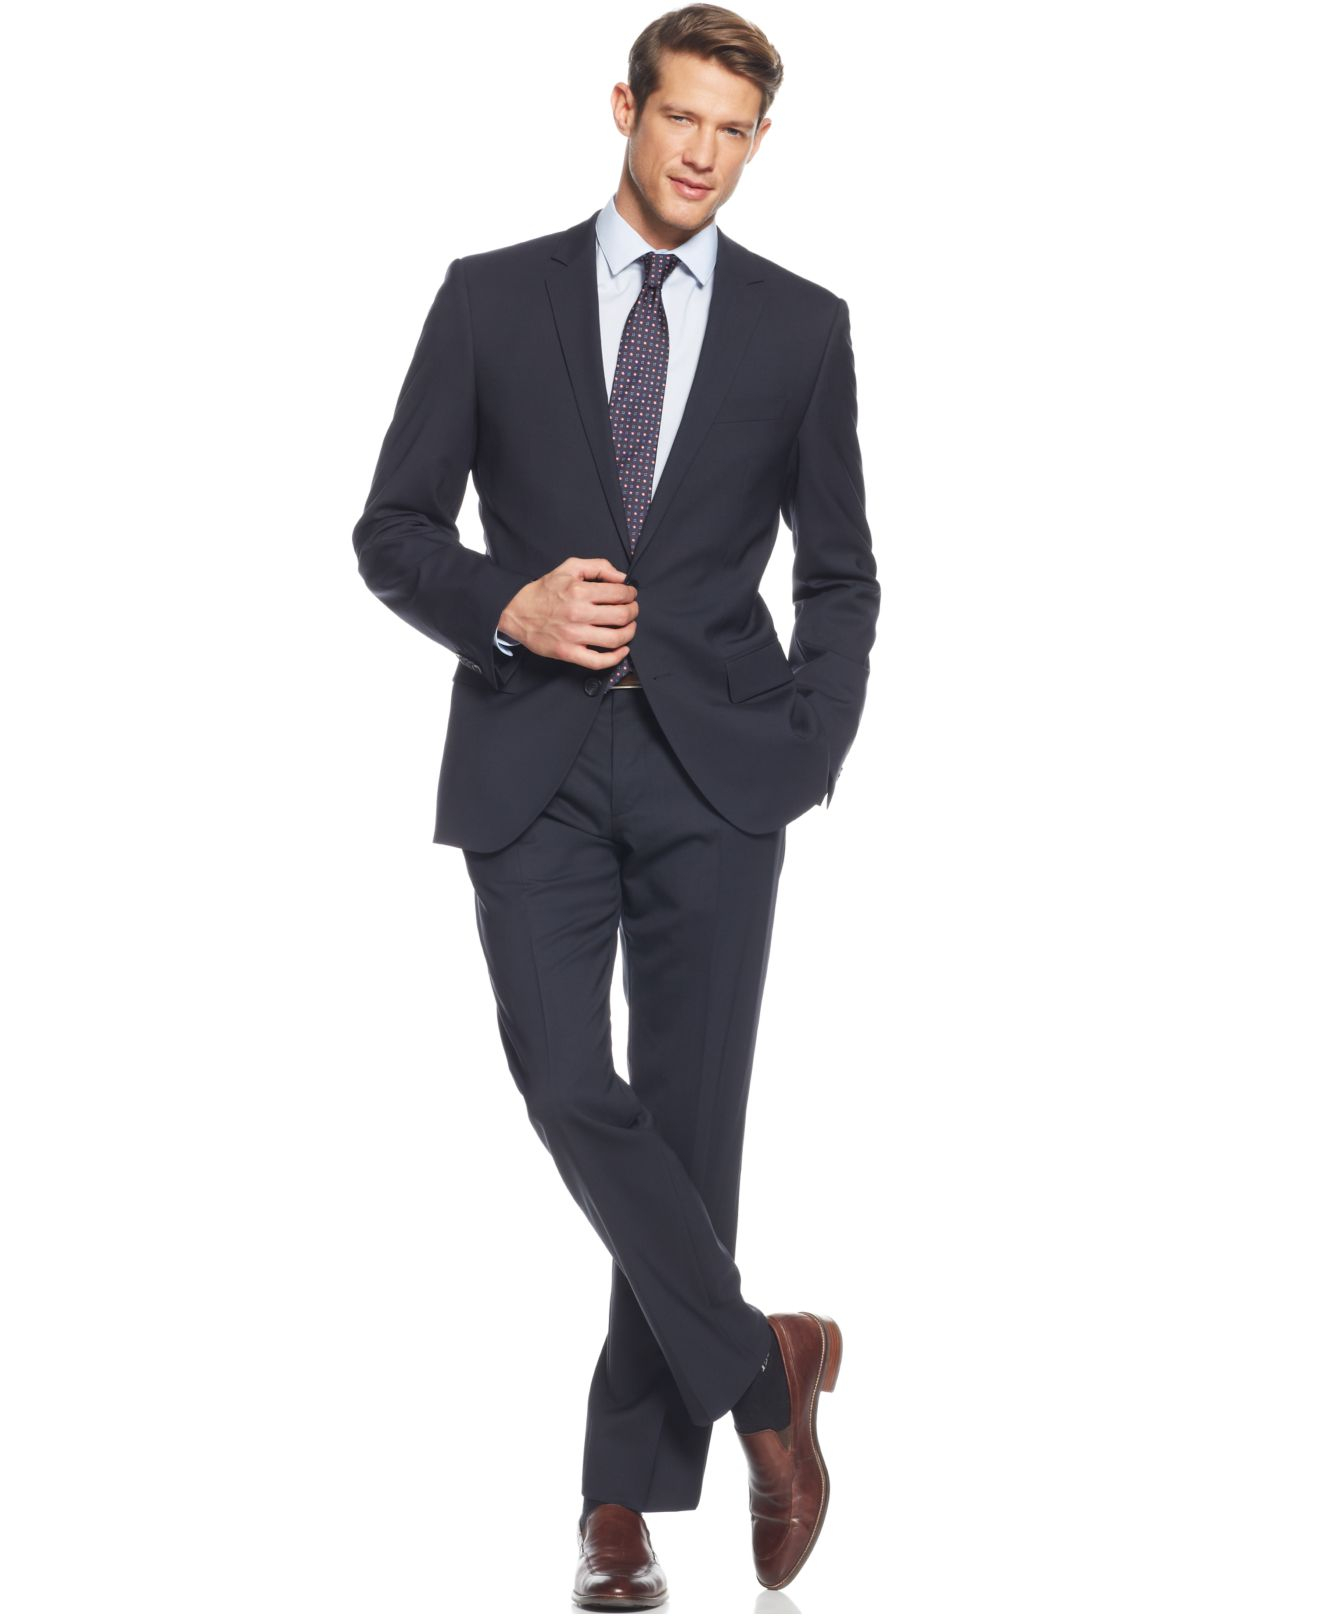 lyst boss boss navy solid jam sharp extra slim fit suit. Black Bedroom Furniture Sets. Home Design Ideas